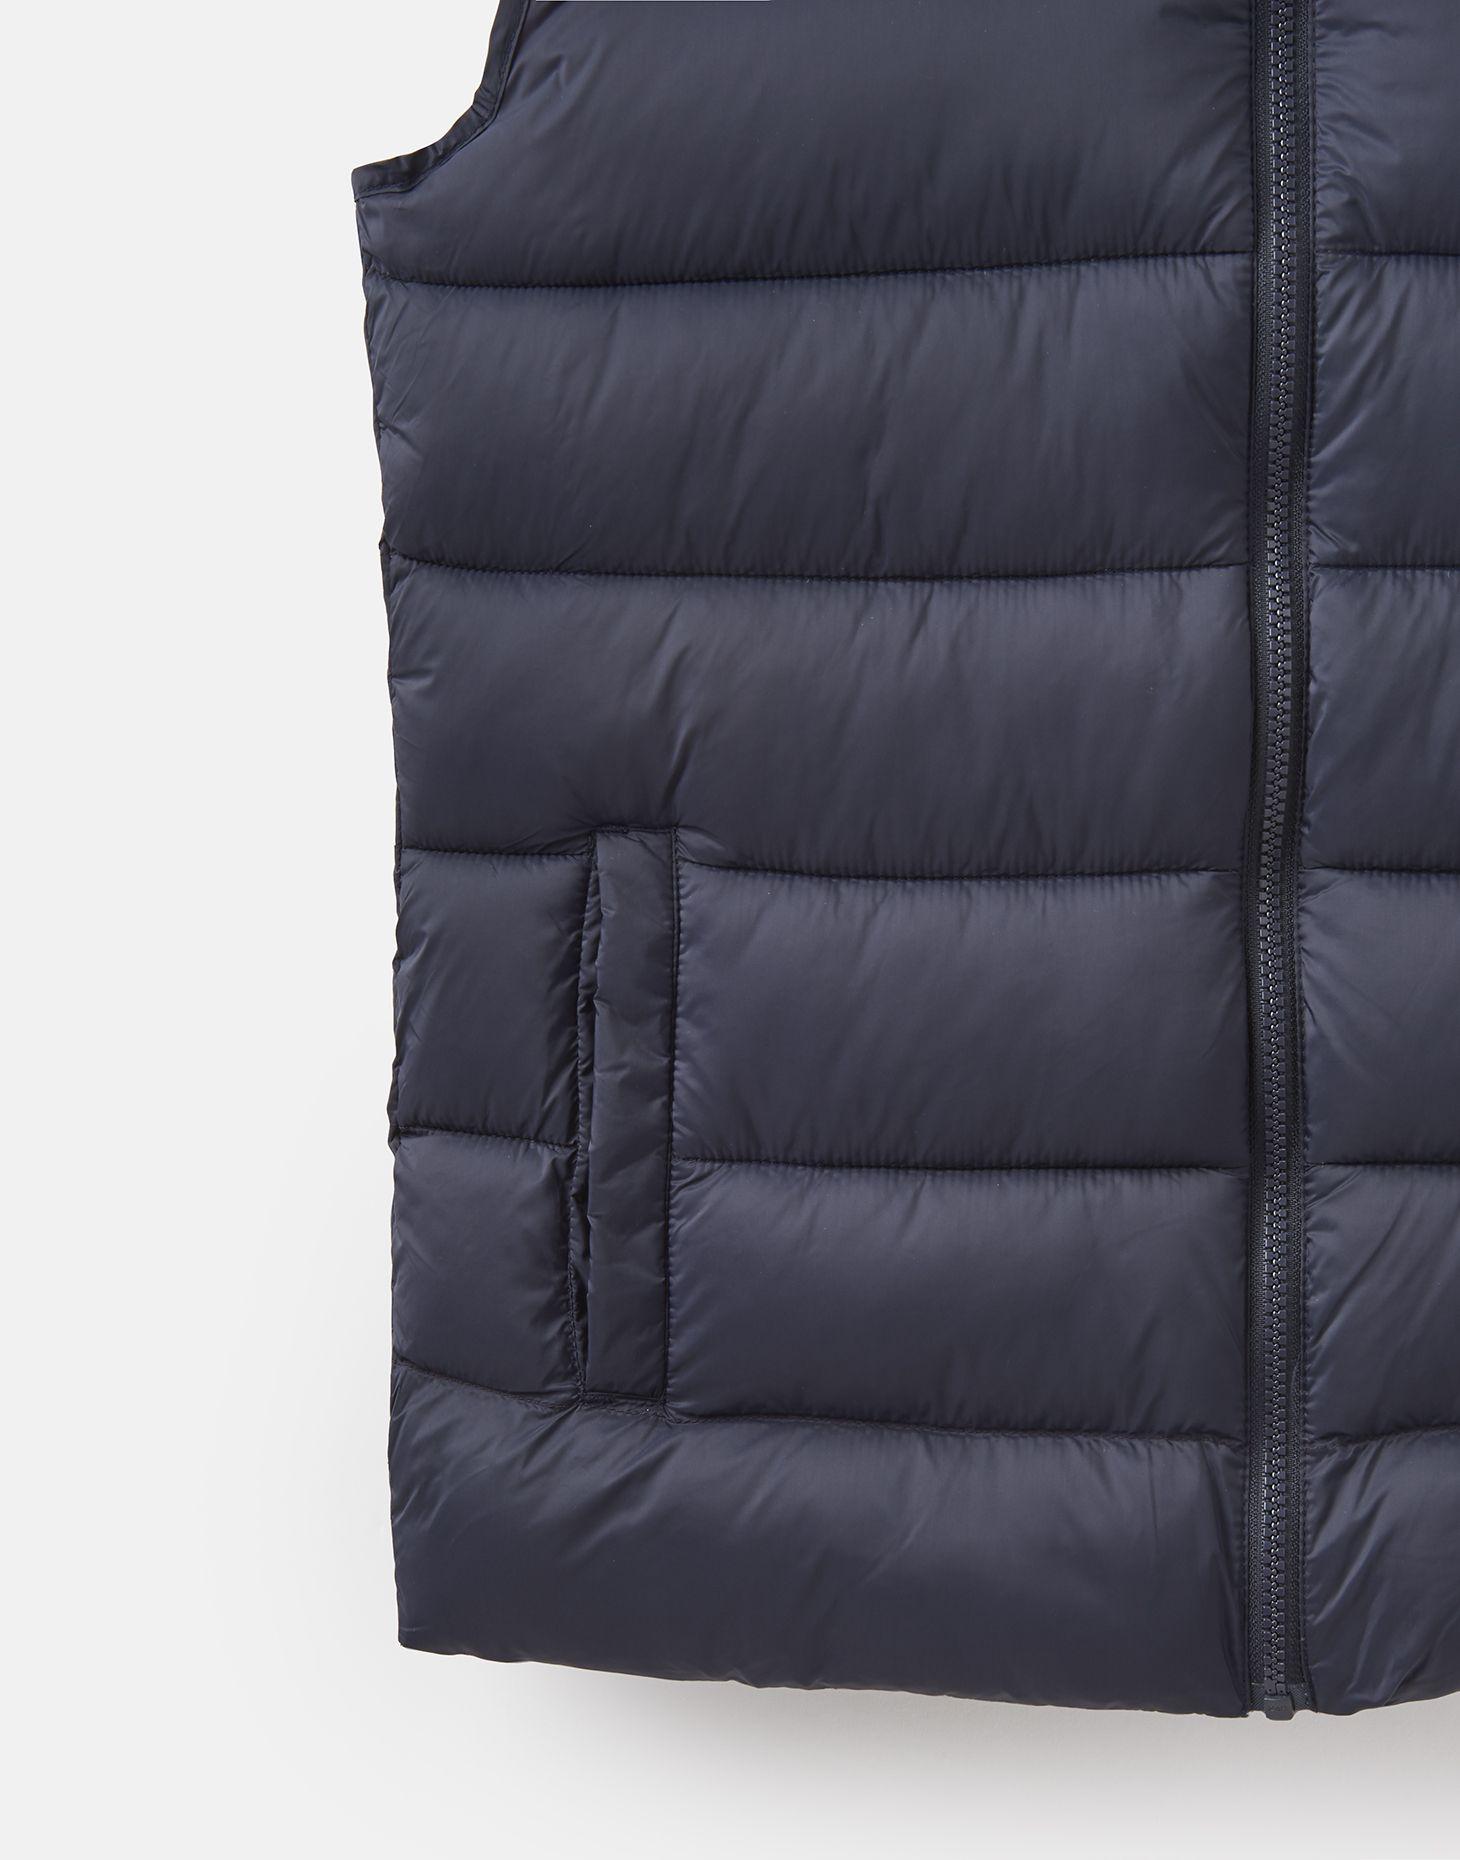 Hajotrawa Men Big Tall Stand Collar Jacket Fit Outwear Fleece Parkas Coats